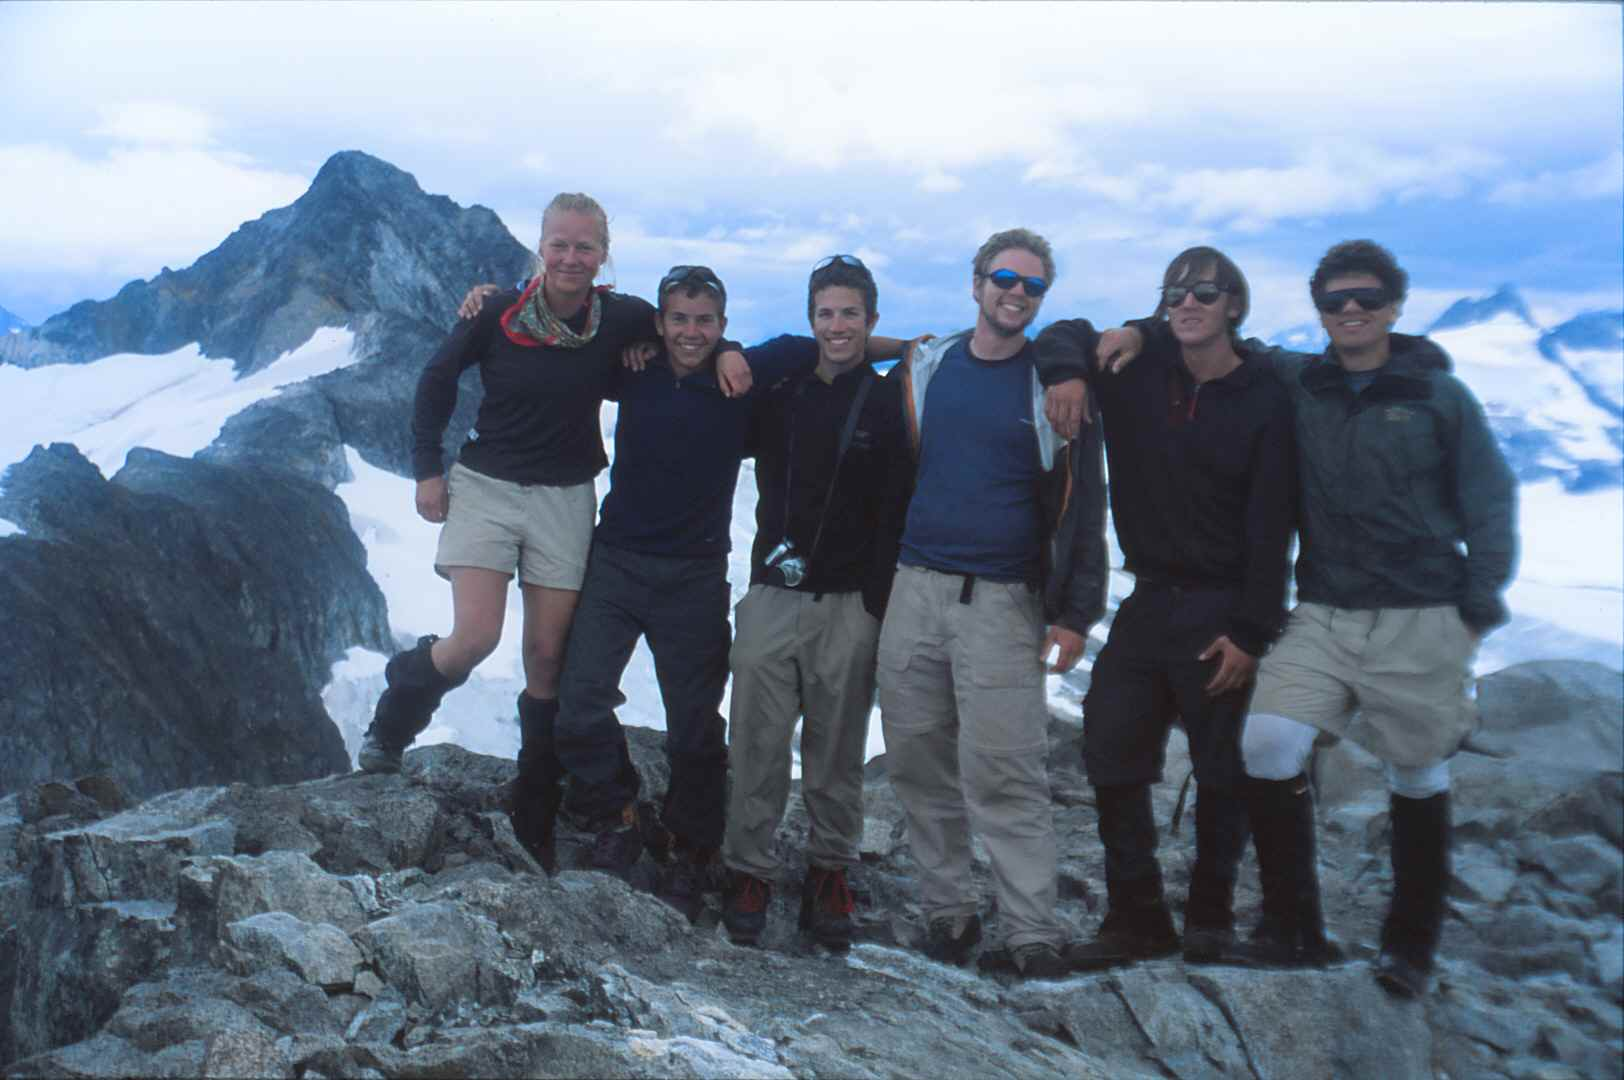 2004 JIRPers on top of 'Taku B'. From left to right: Kate Harris, Riley Hall, Evan Burgess, Keith (Laskowski) Ma, Winston Macdonald, and Robert Koenig. Photo: M. J. Beedle